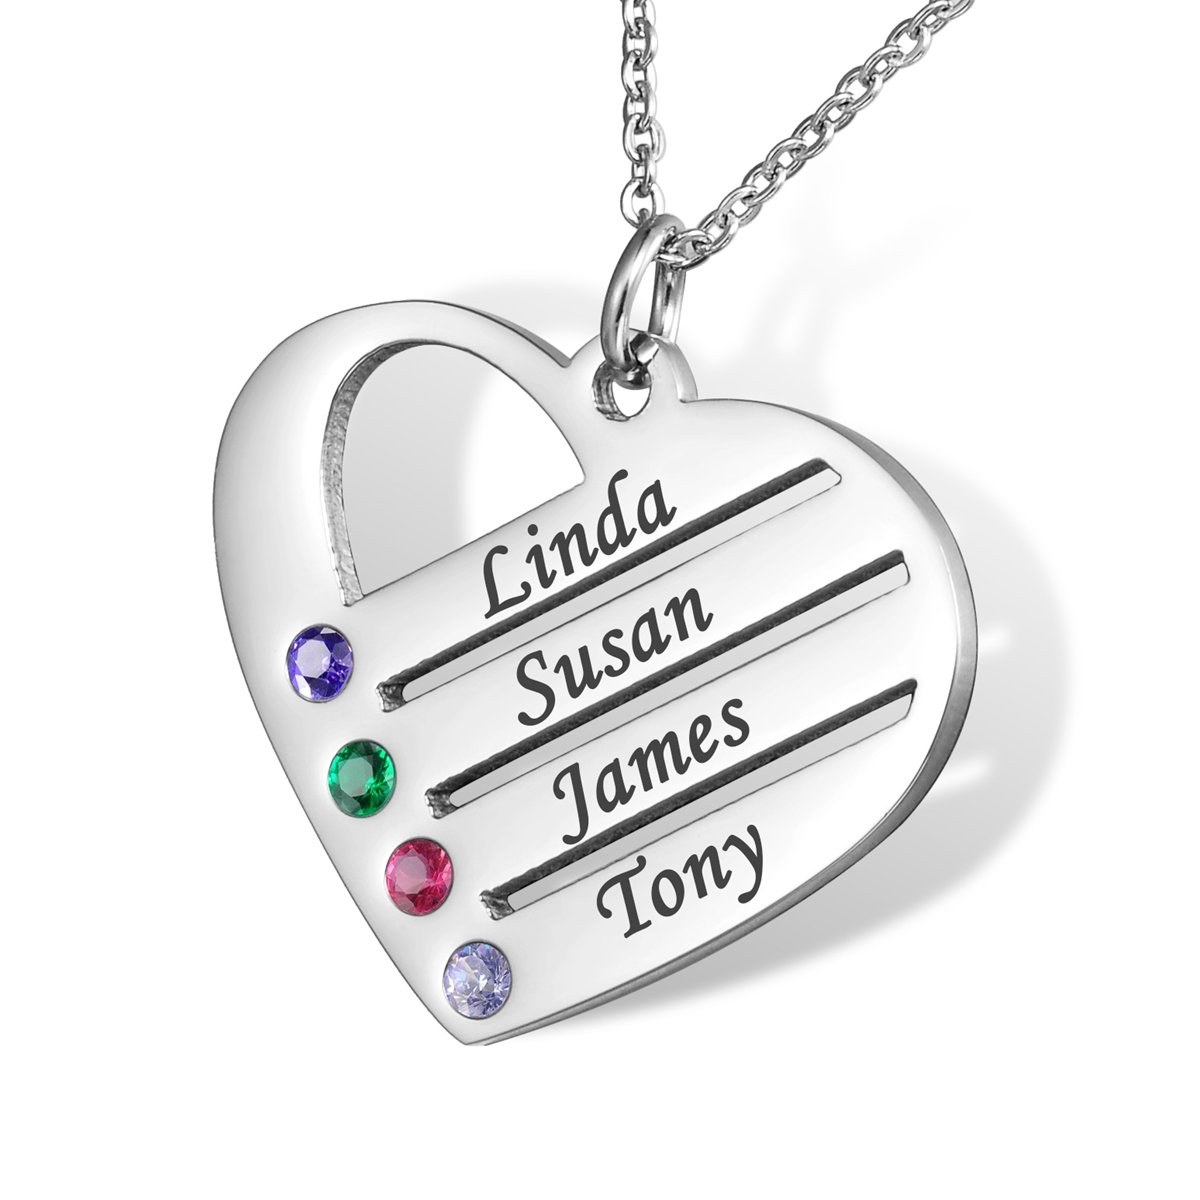 HOUSWEETY Love Family Pendant Heart BFF Necklace with Birthstones - Birthstone Heart Necklace - Custom Made with 4 Names HOUSWEETYB107345-CA